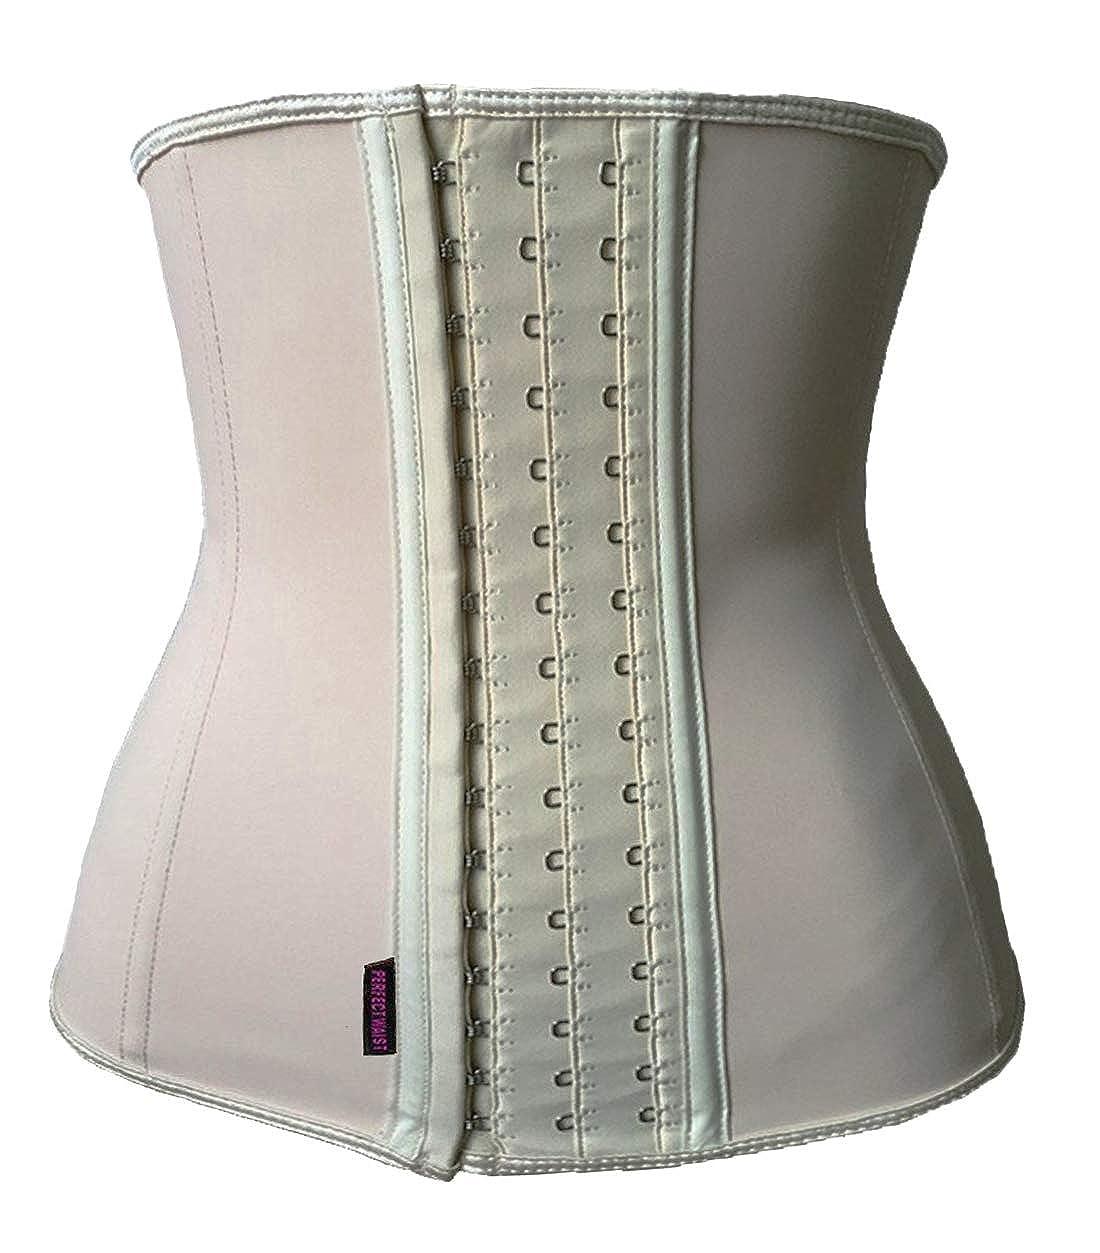 75182b2a5 DILANNI Women s Underbust Latex Sport Girdle Waist Trainer Corsets  Hourglass Body Shaper at Amazon Women s Clothing store